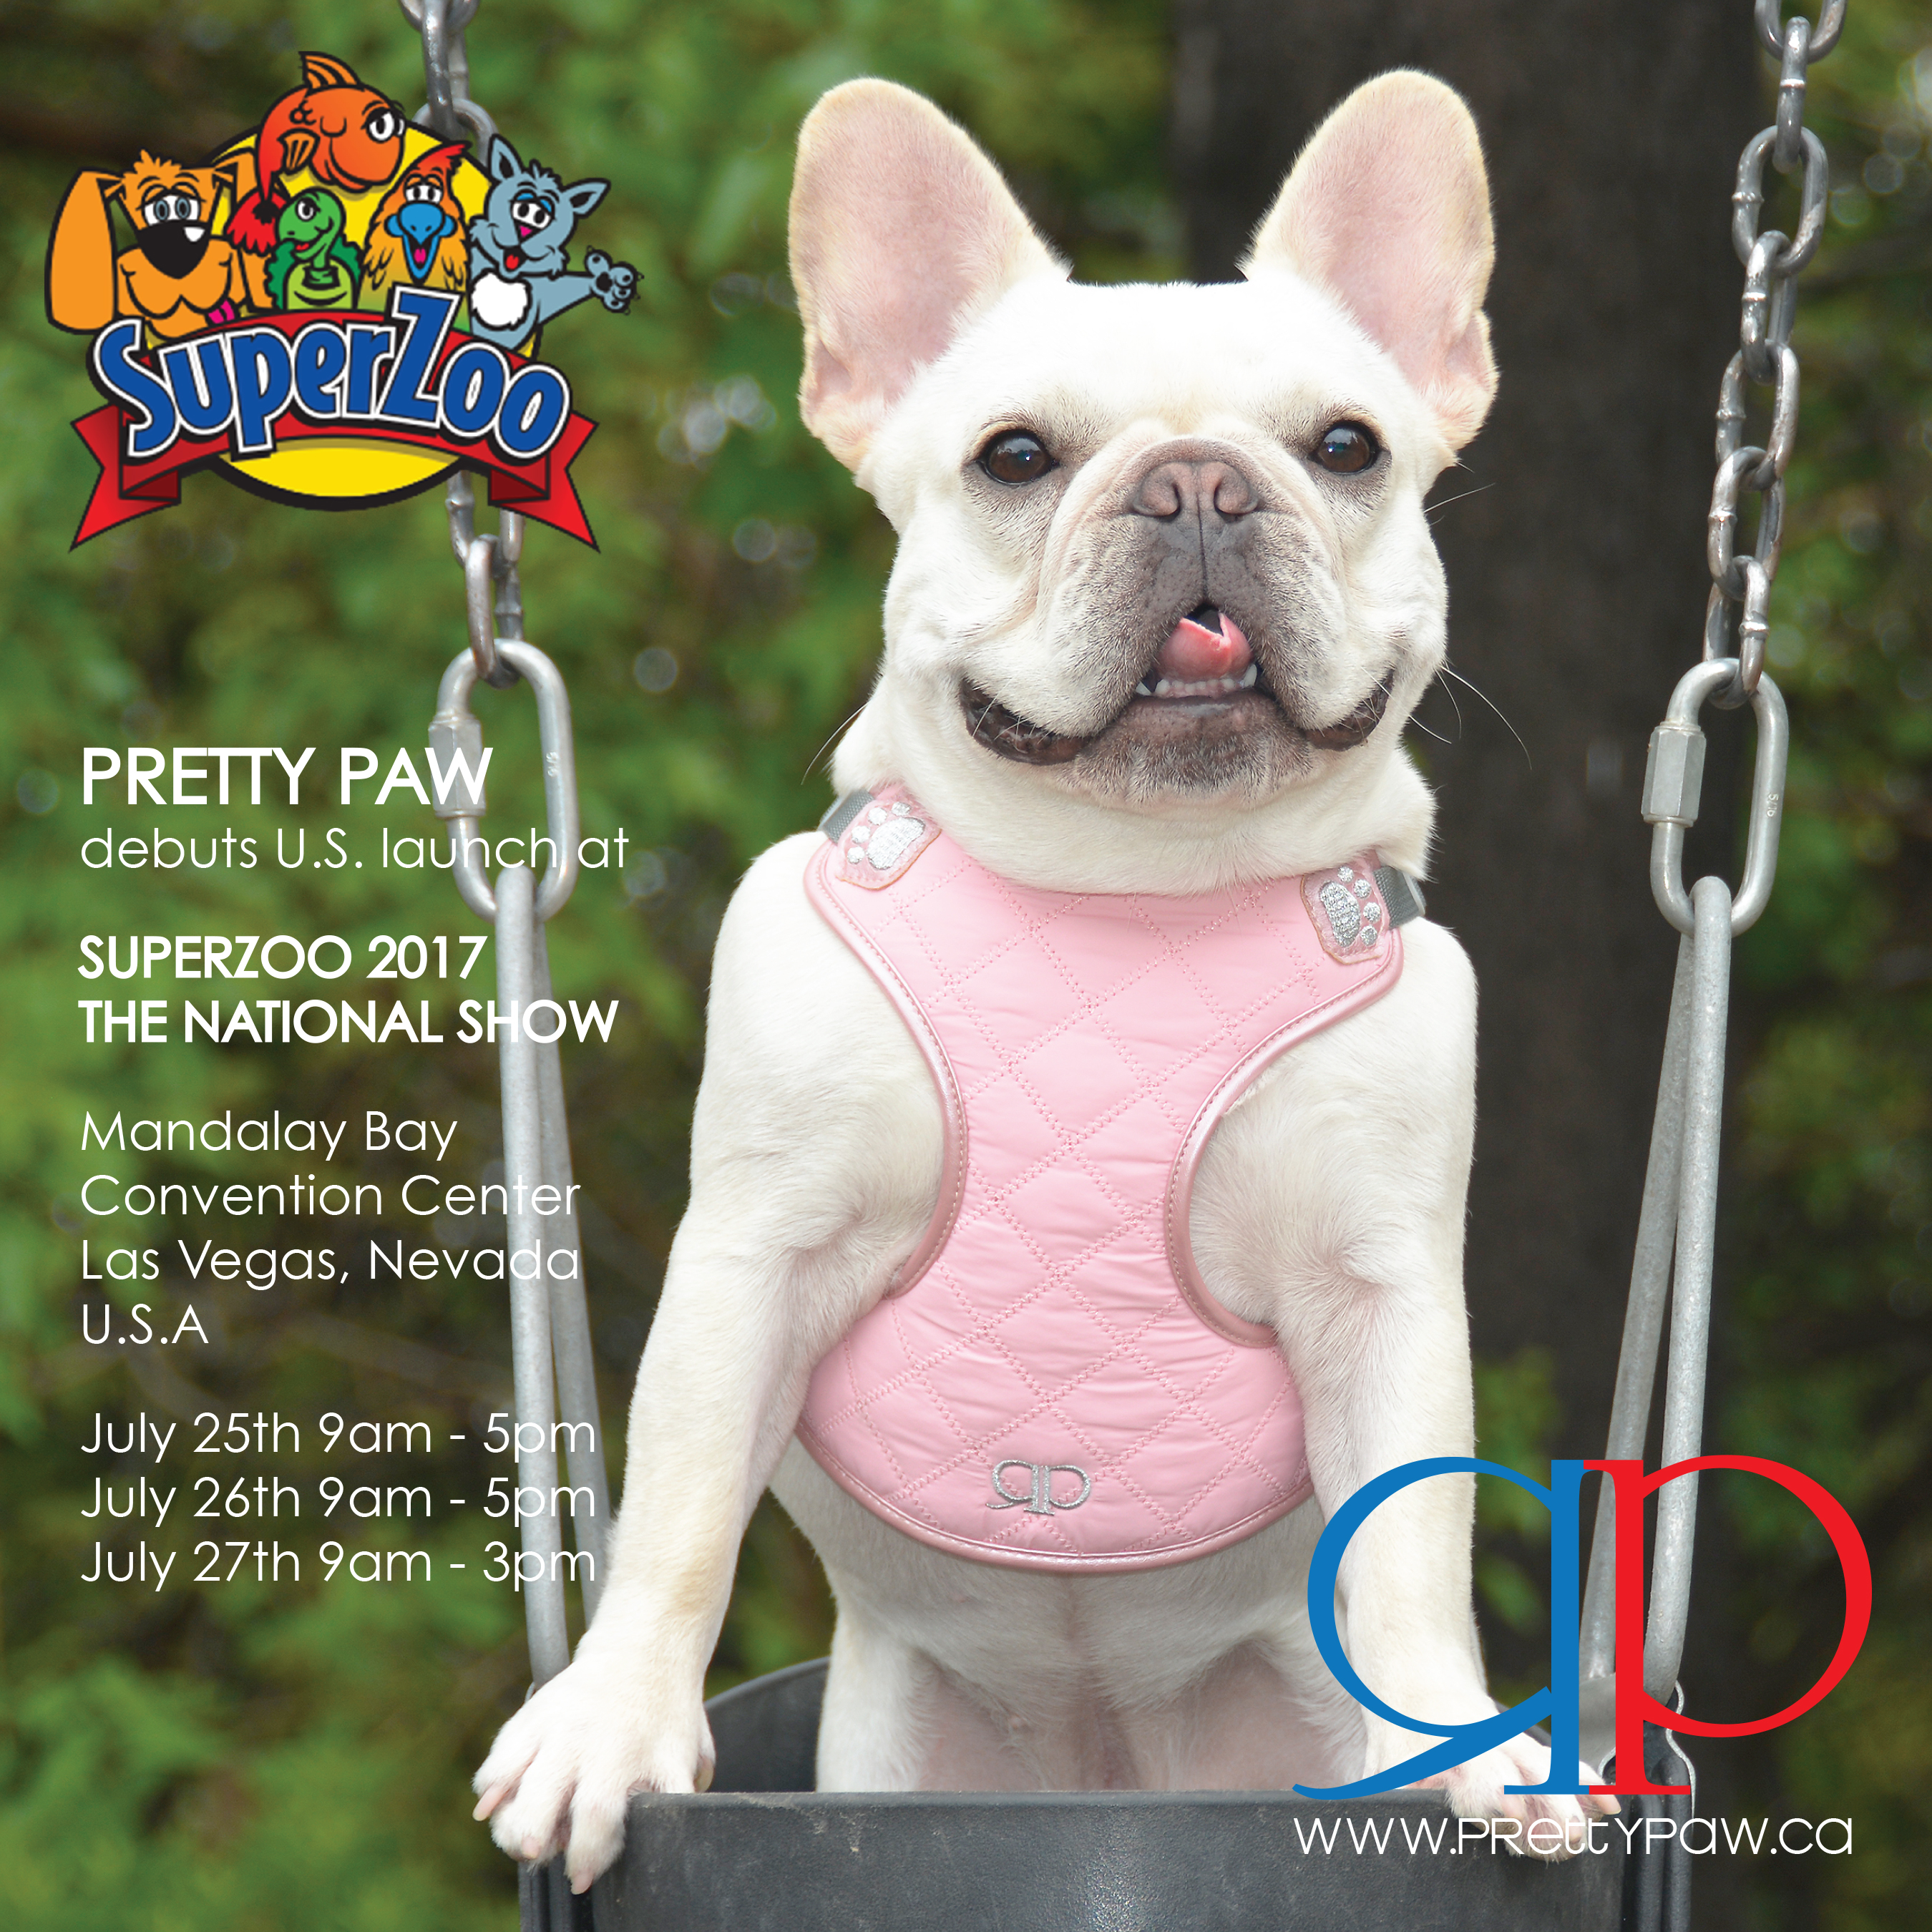 Pretty Paw Dog Harness - Wiring Diagram For Light Switch •